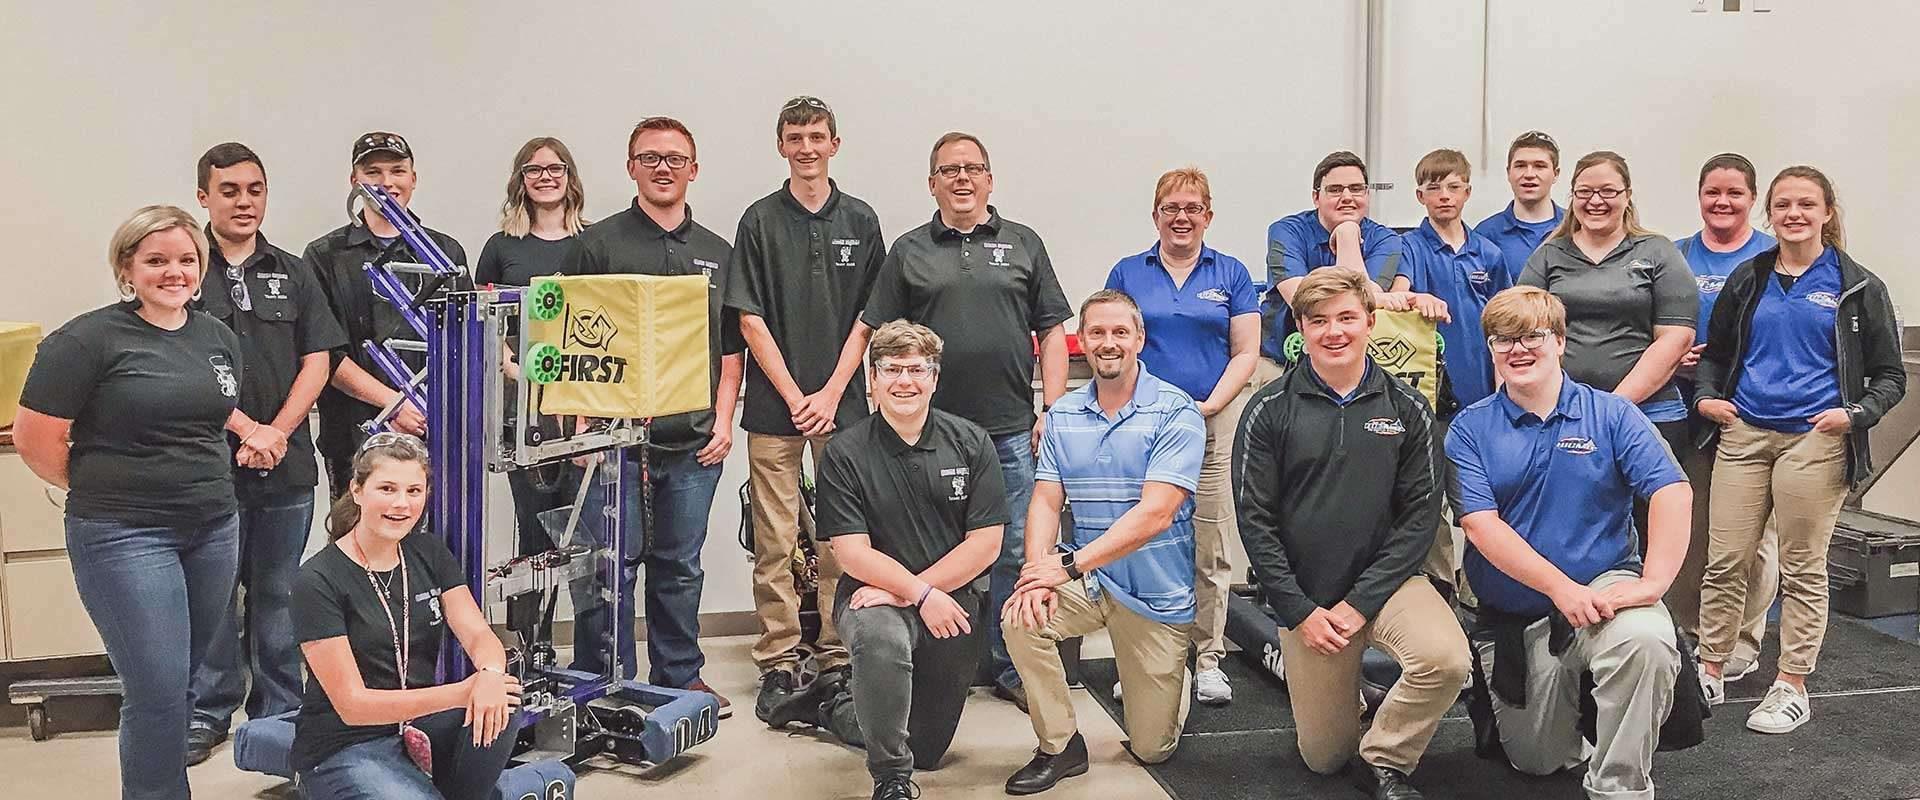 Valianttms First Robotics Demo Auburn Hills 2018 08 02 0330